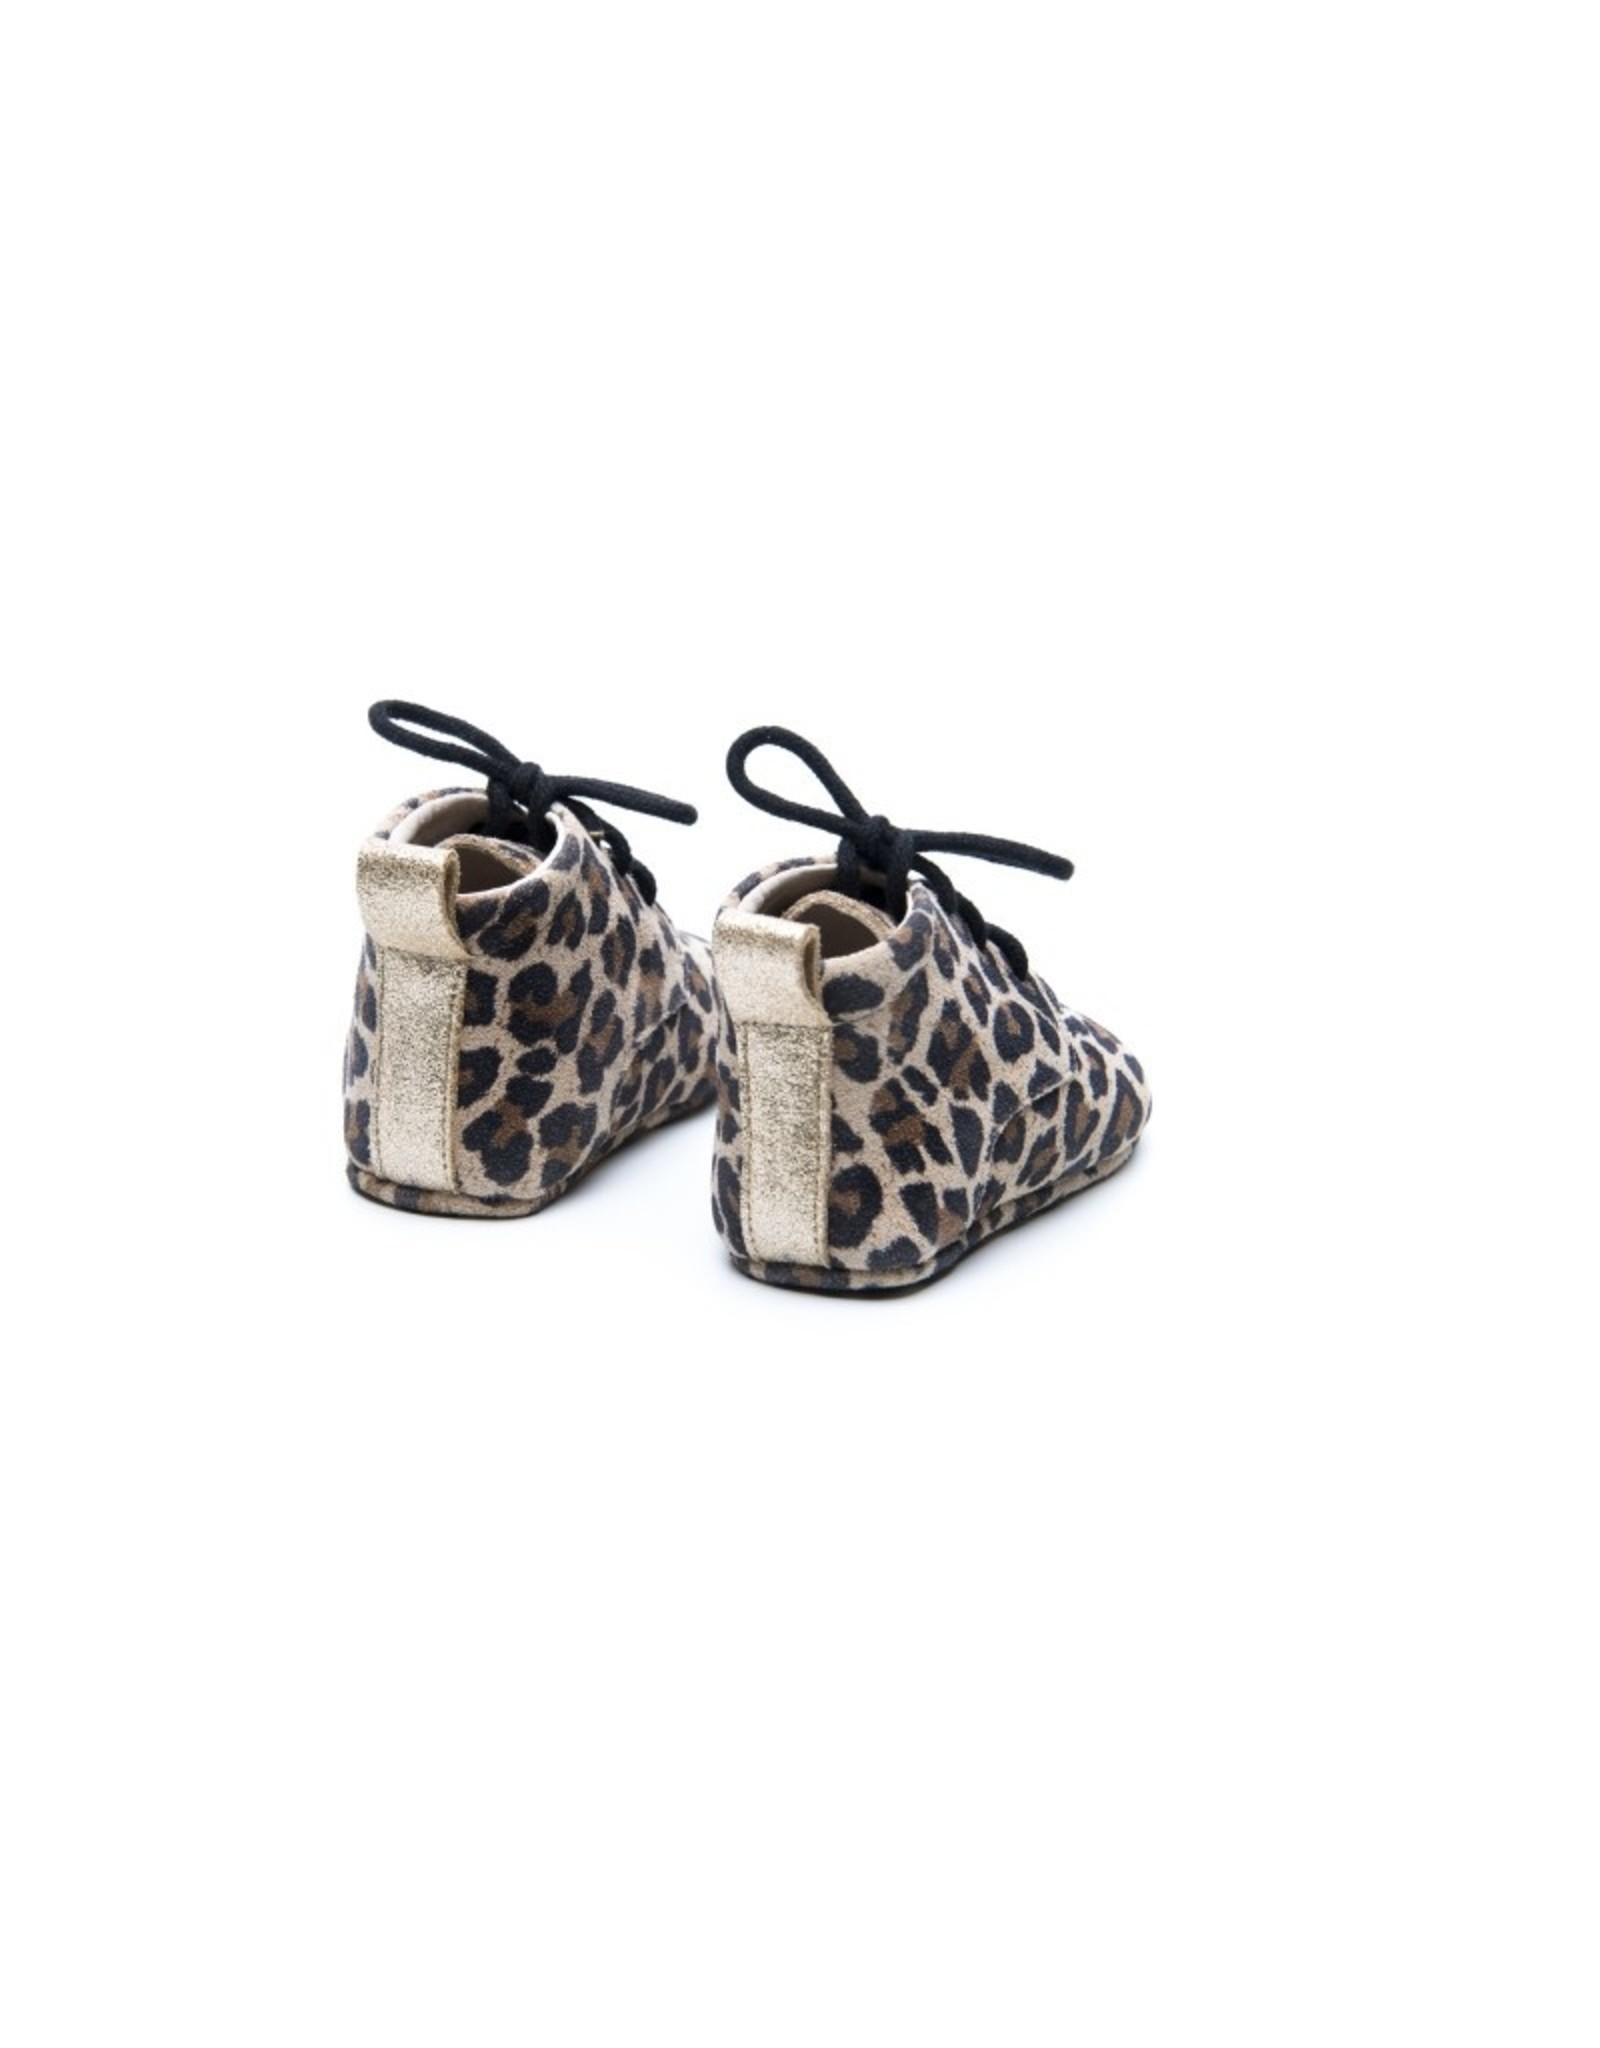 Mockies Mockies Classic Boots Leopard Gold